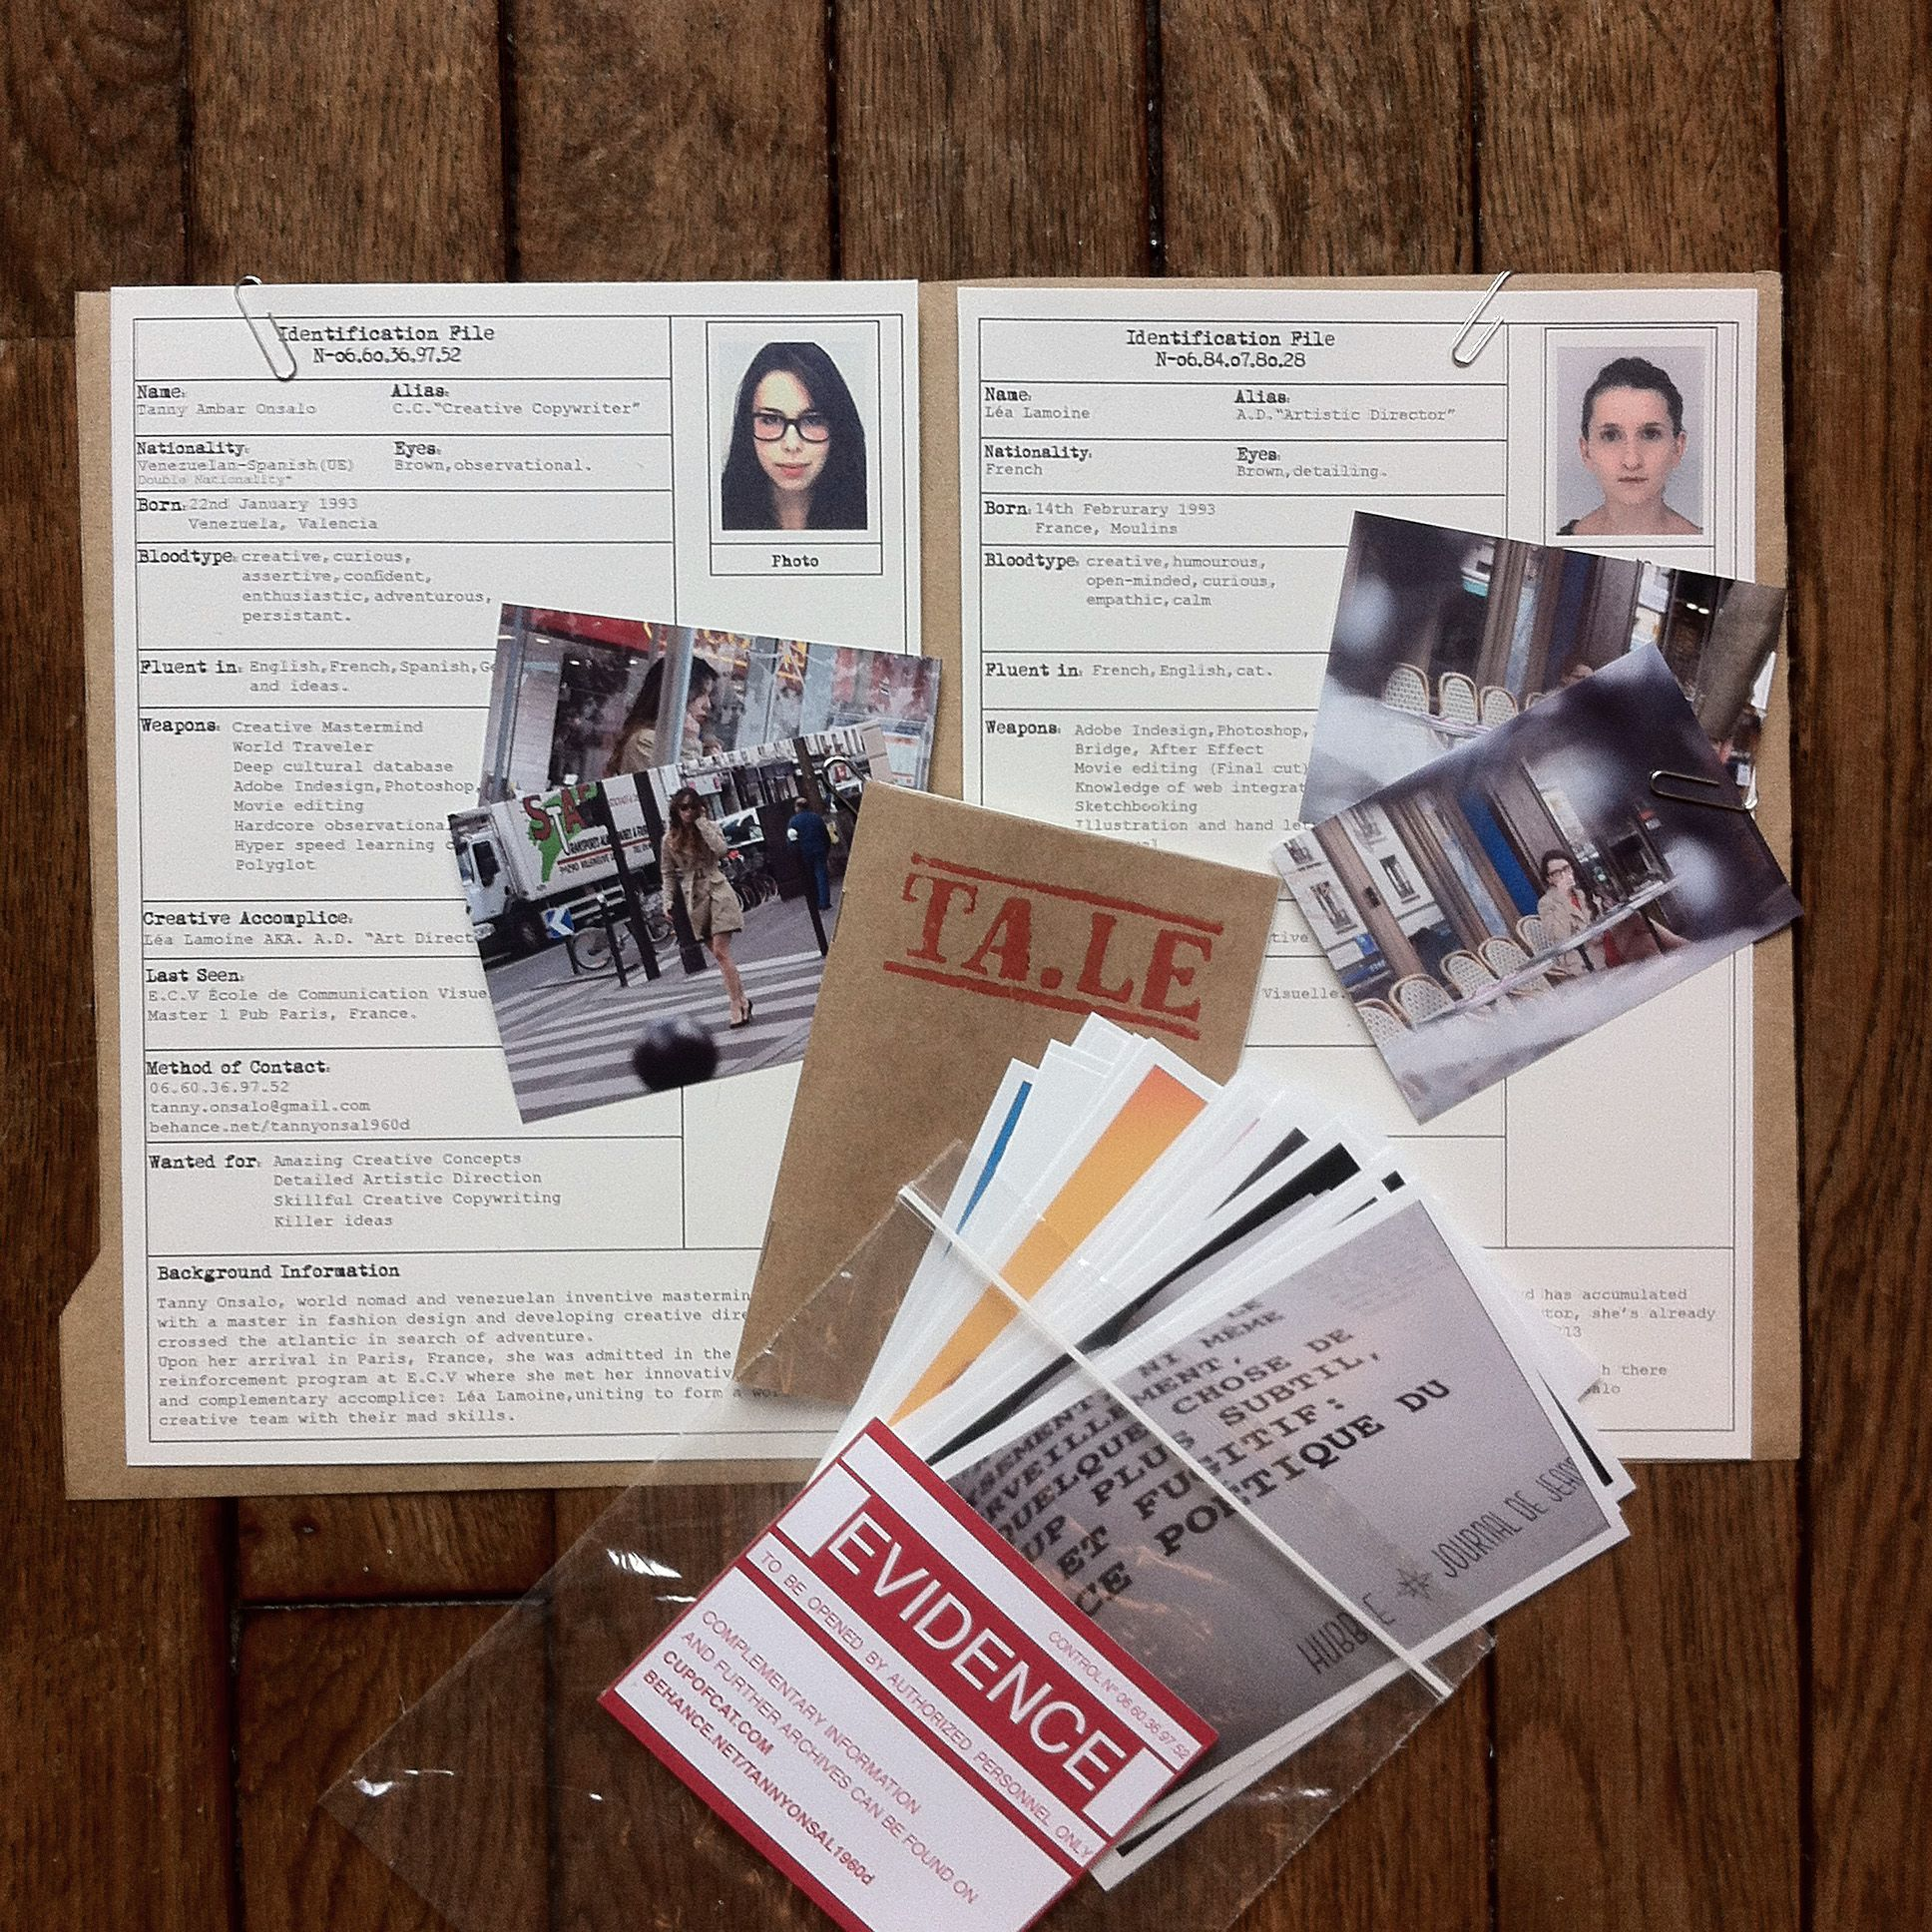 cv original dossier enquete police filature creatives team crea confidentiel